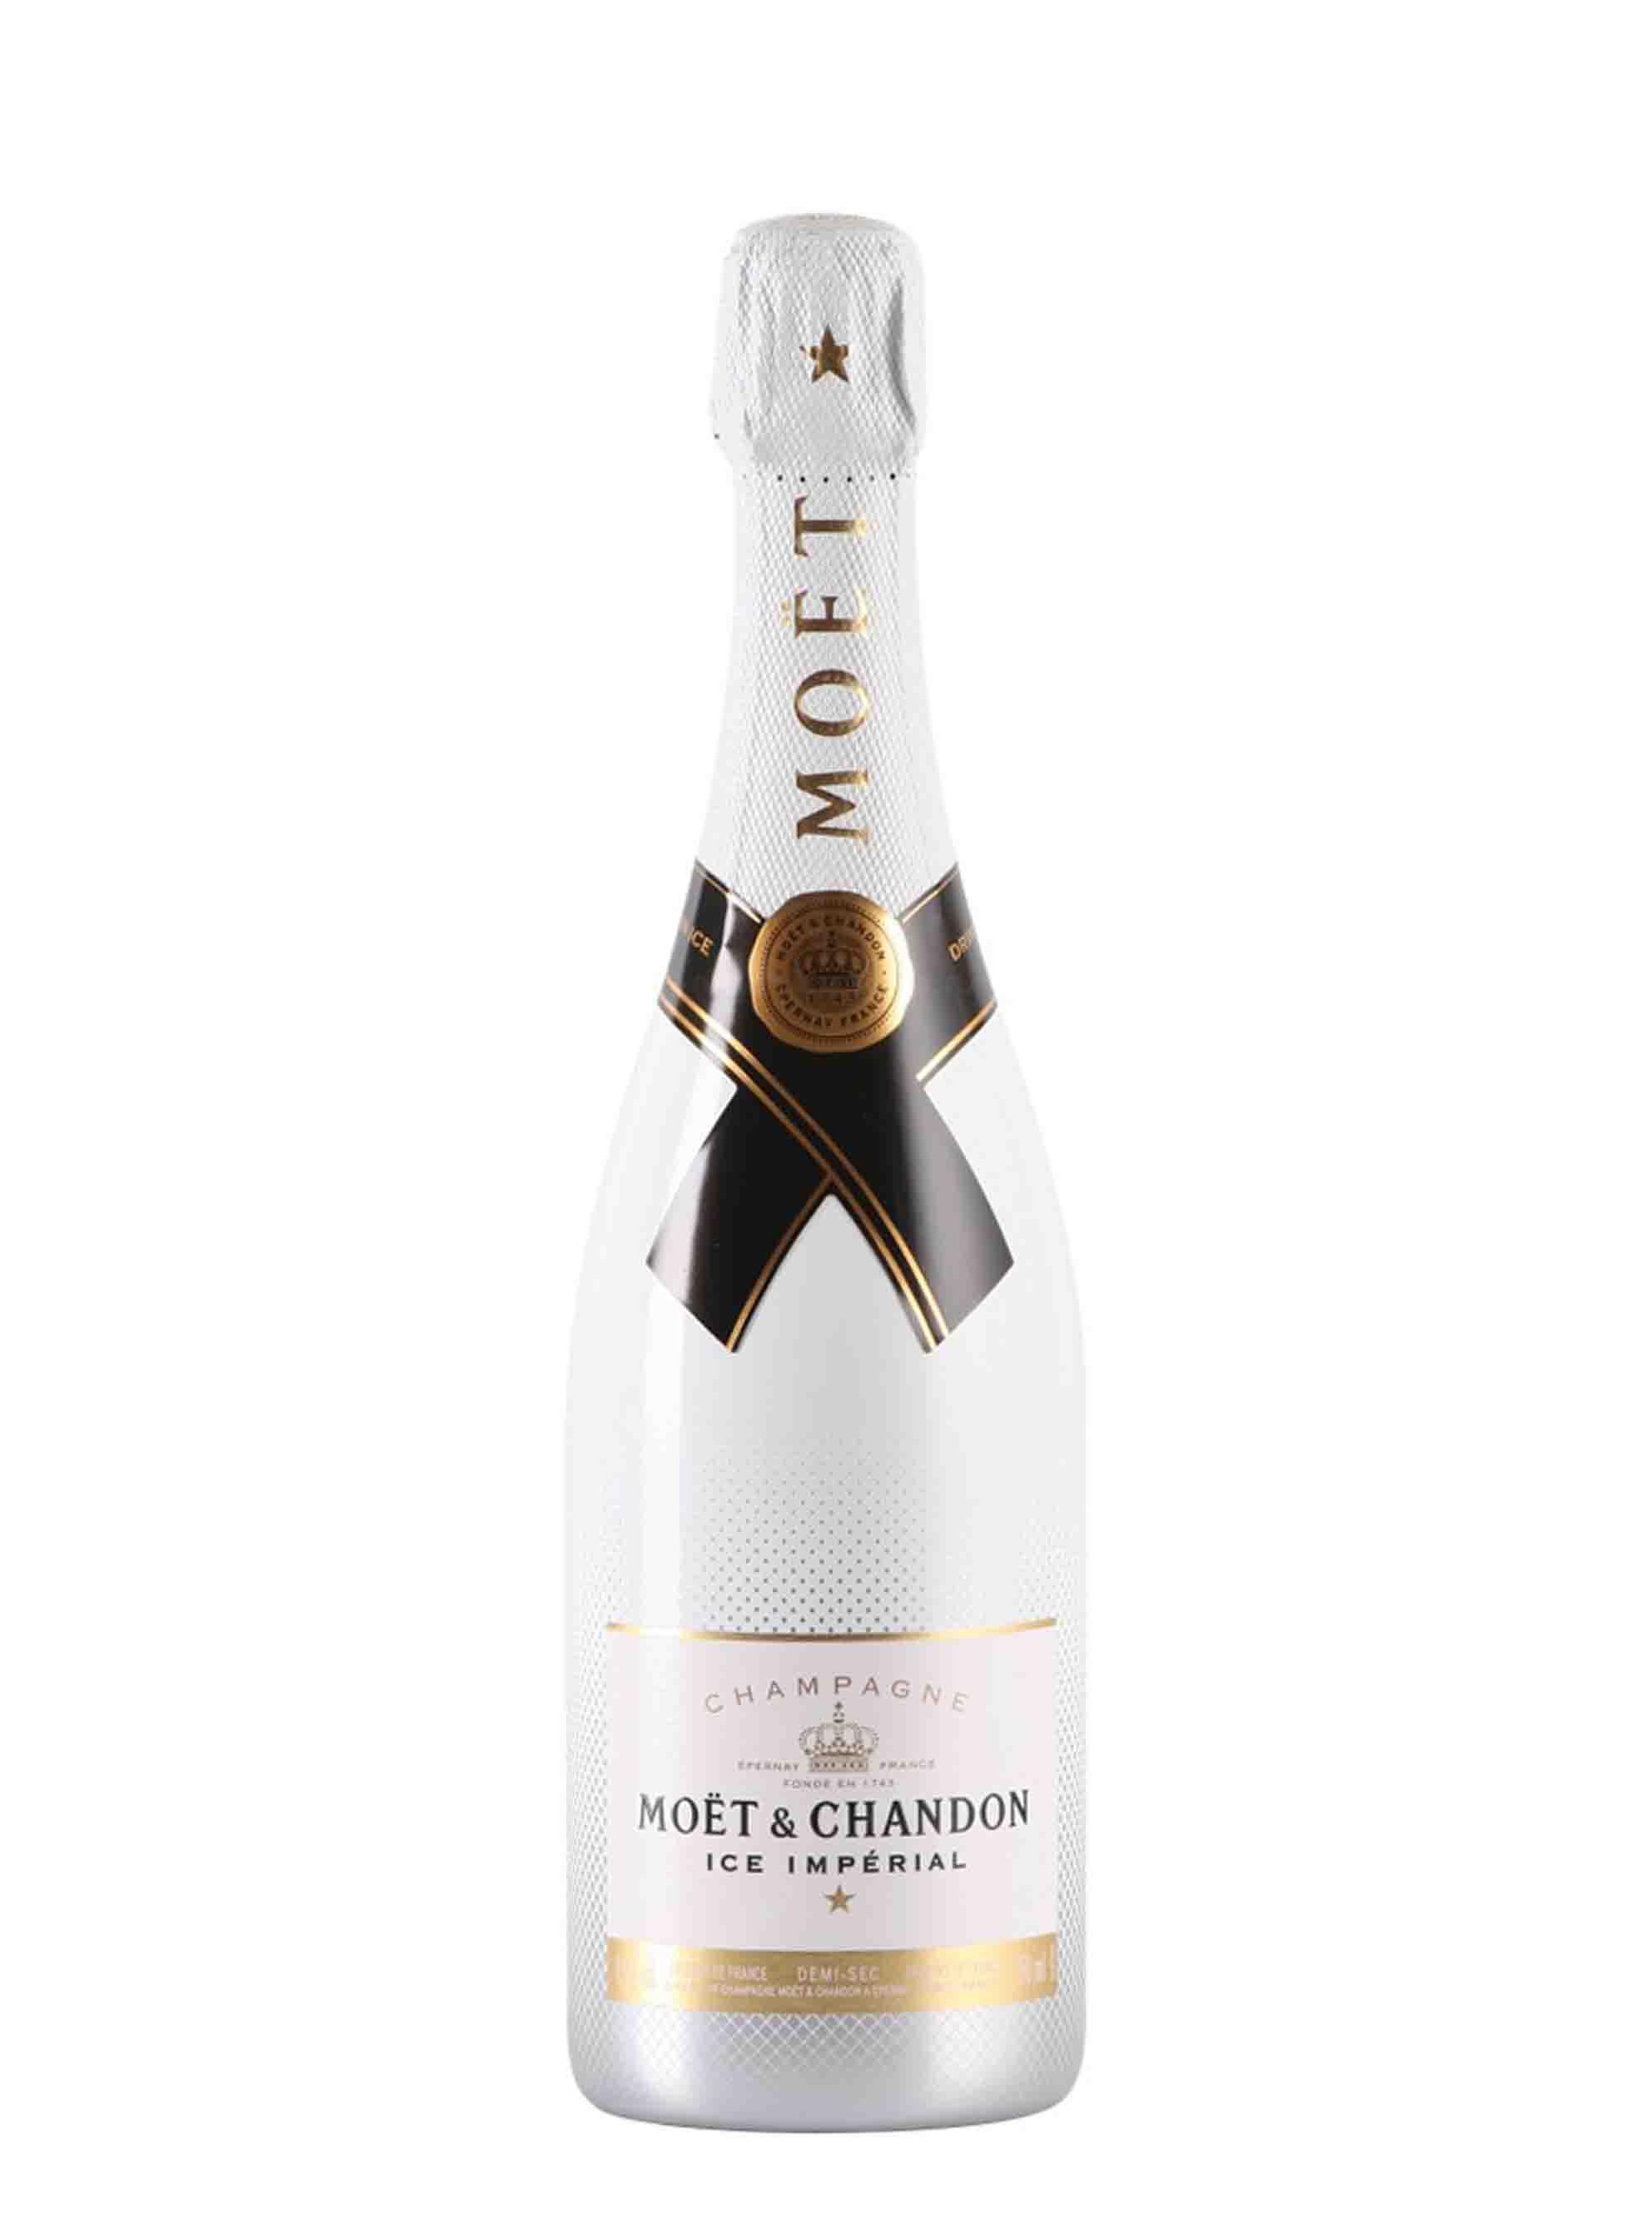 Champagne, Ice Impérial, Moet - Chandon, 0.75 l